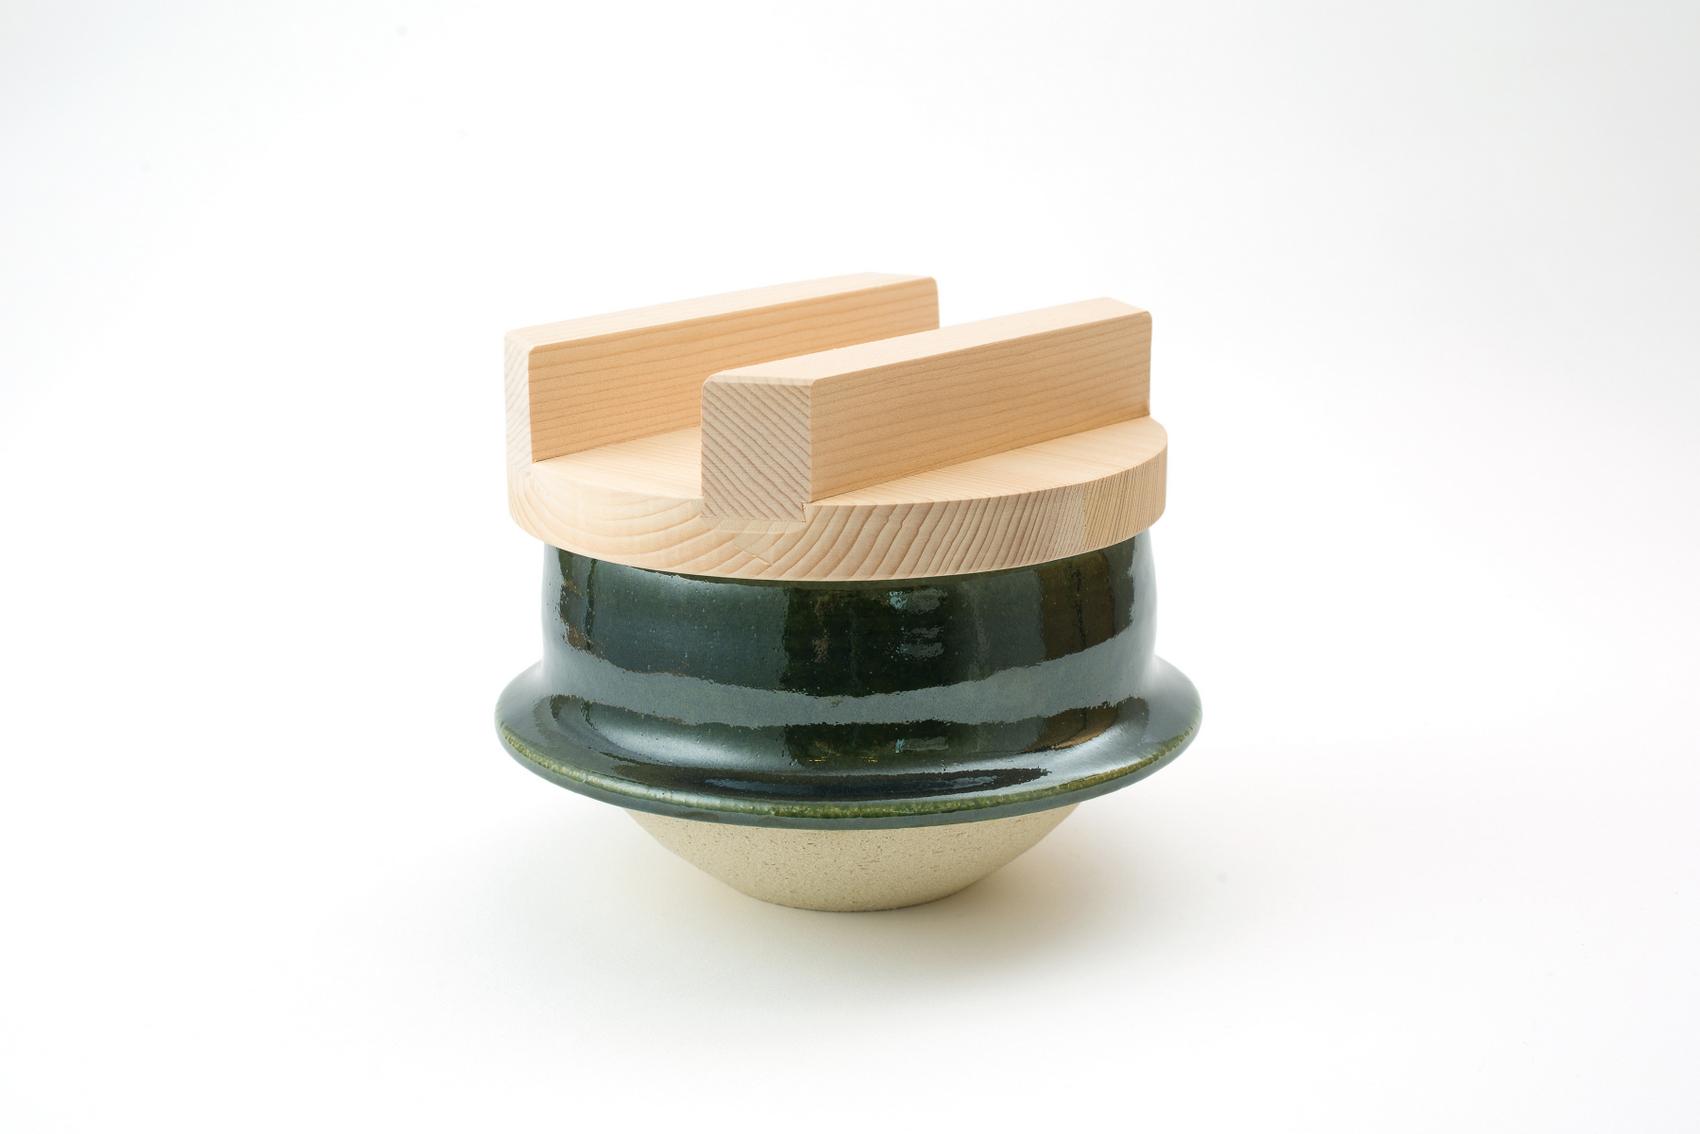 土楽・織部羽釜8寸(4〜8合炊き)